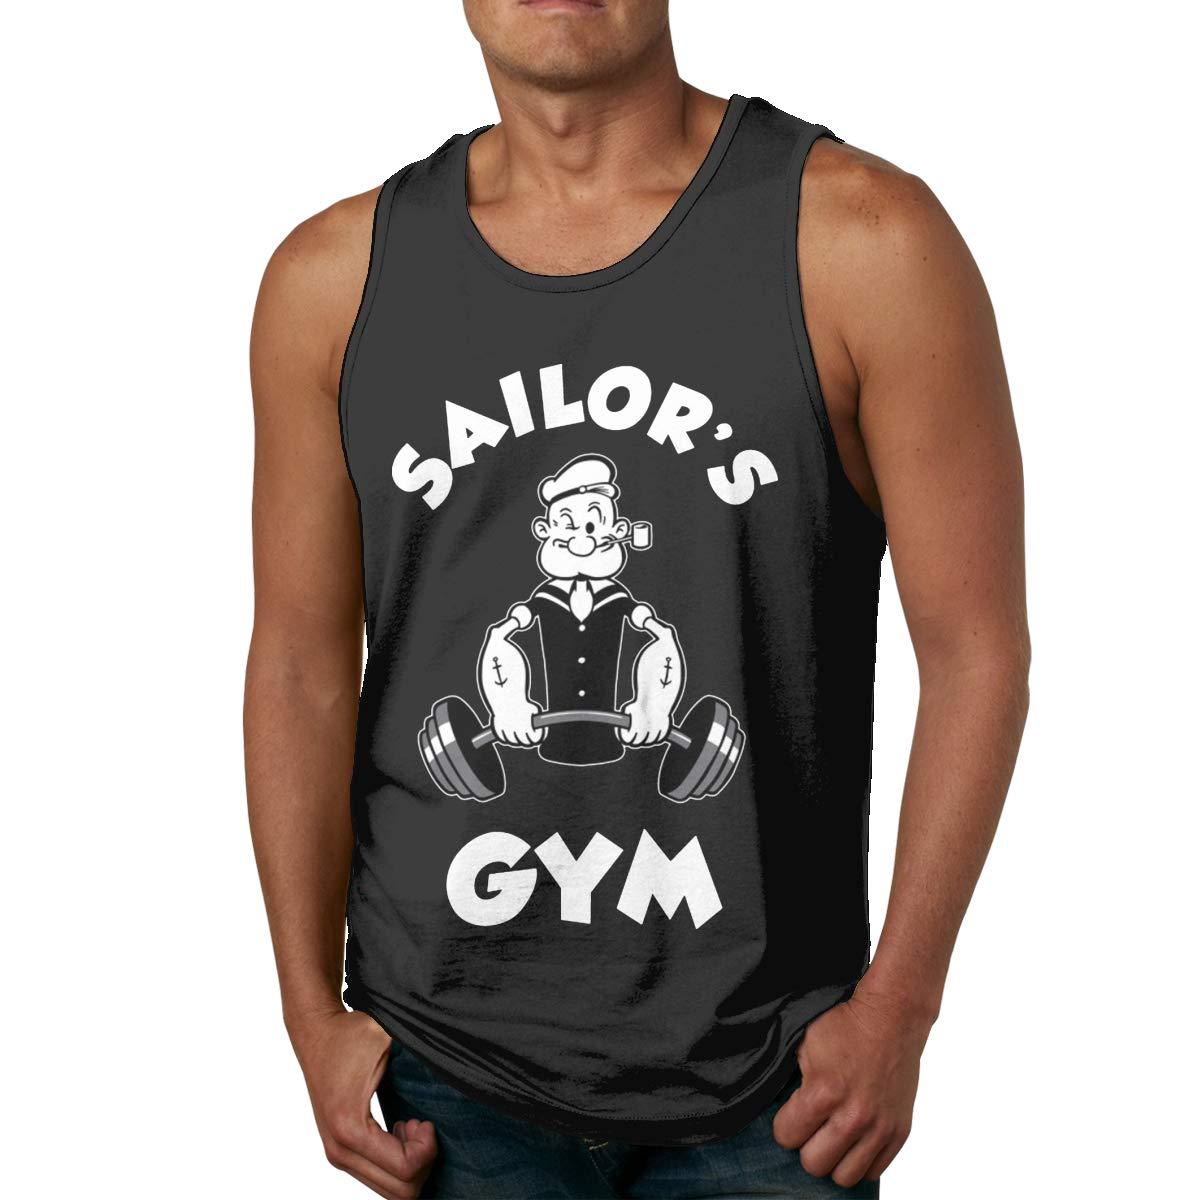 Kaddias Sailor S Gym Popeye S Tank Top Shirt Black